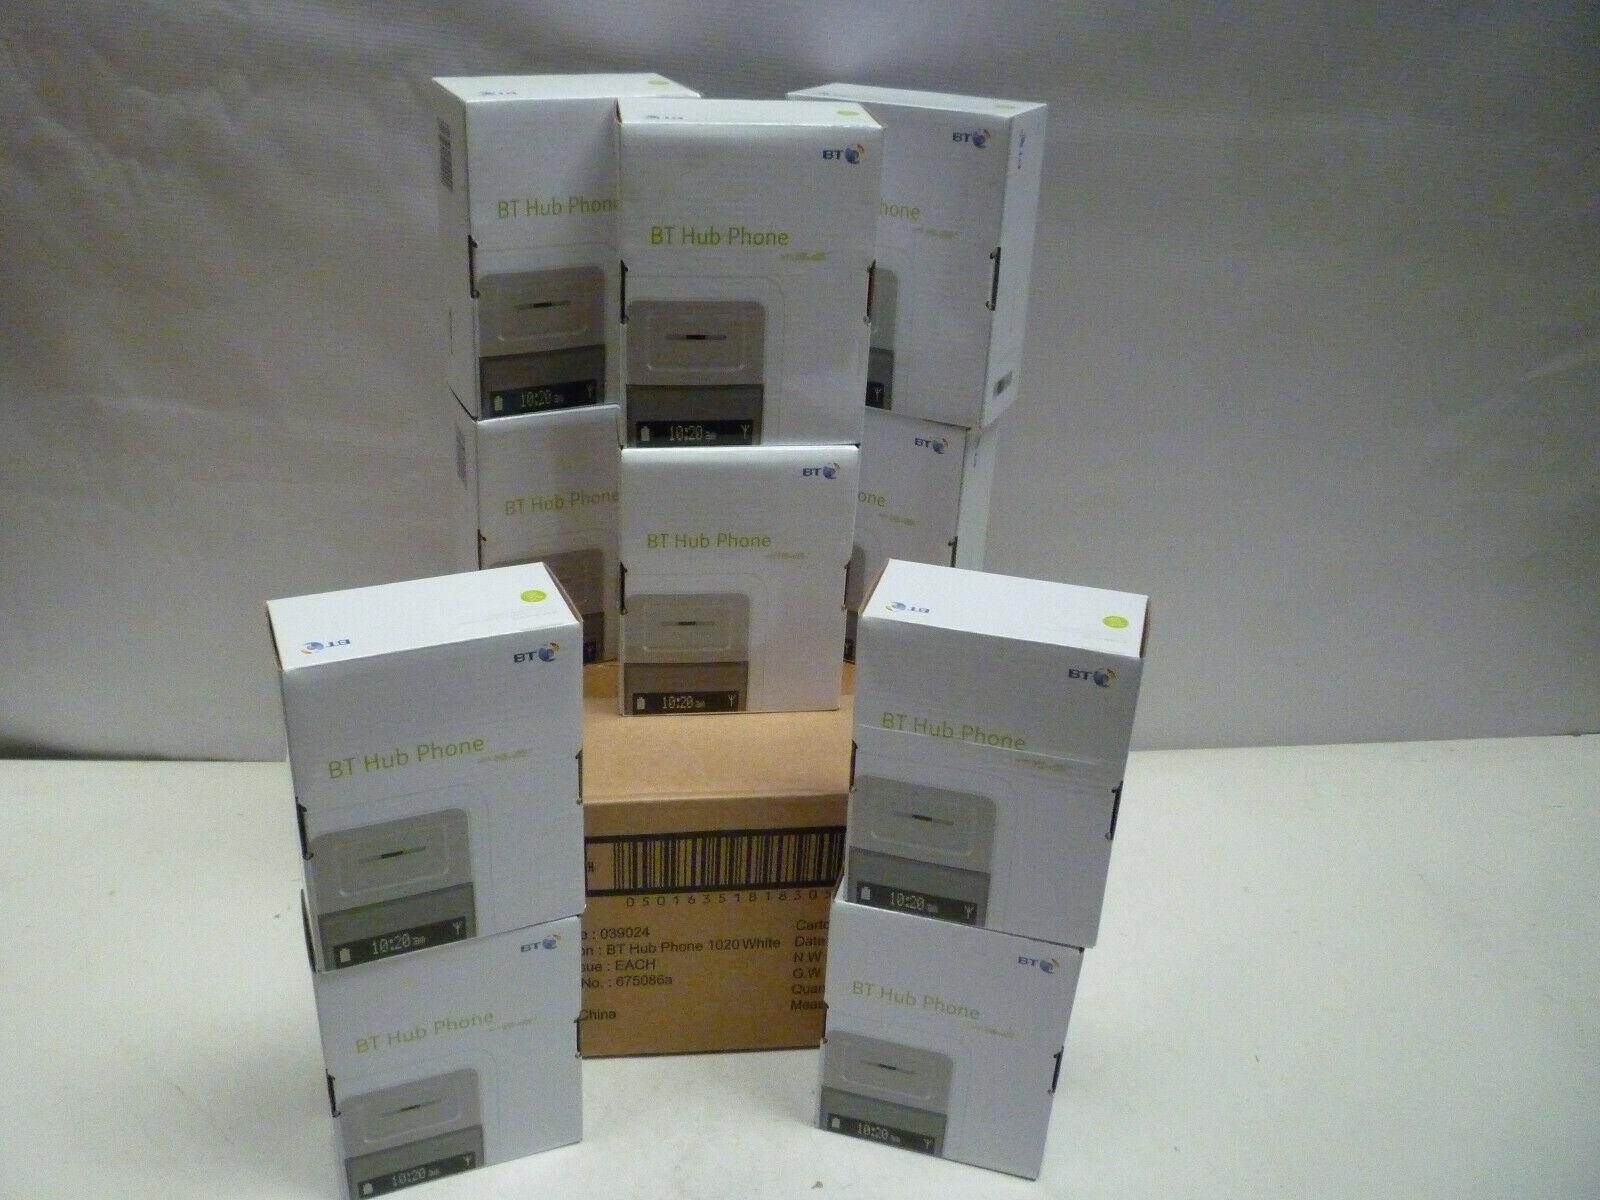 10 x BT Home Hub Phones 1020 Job Lot Bulk Wholesale Joblot Stock Boxed and New